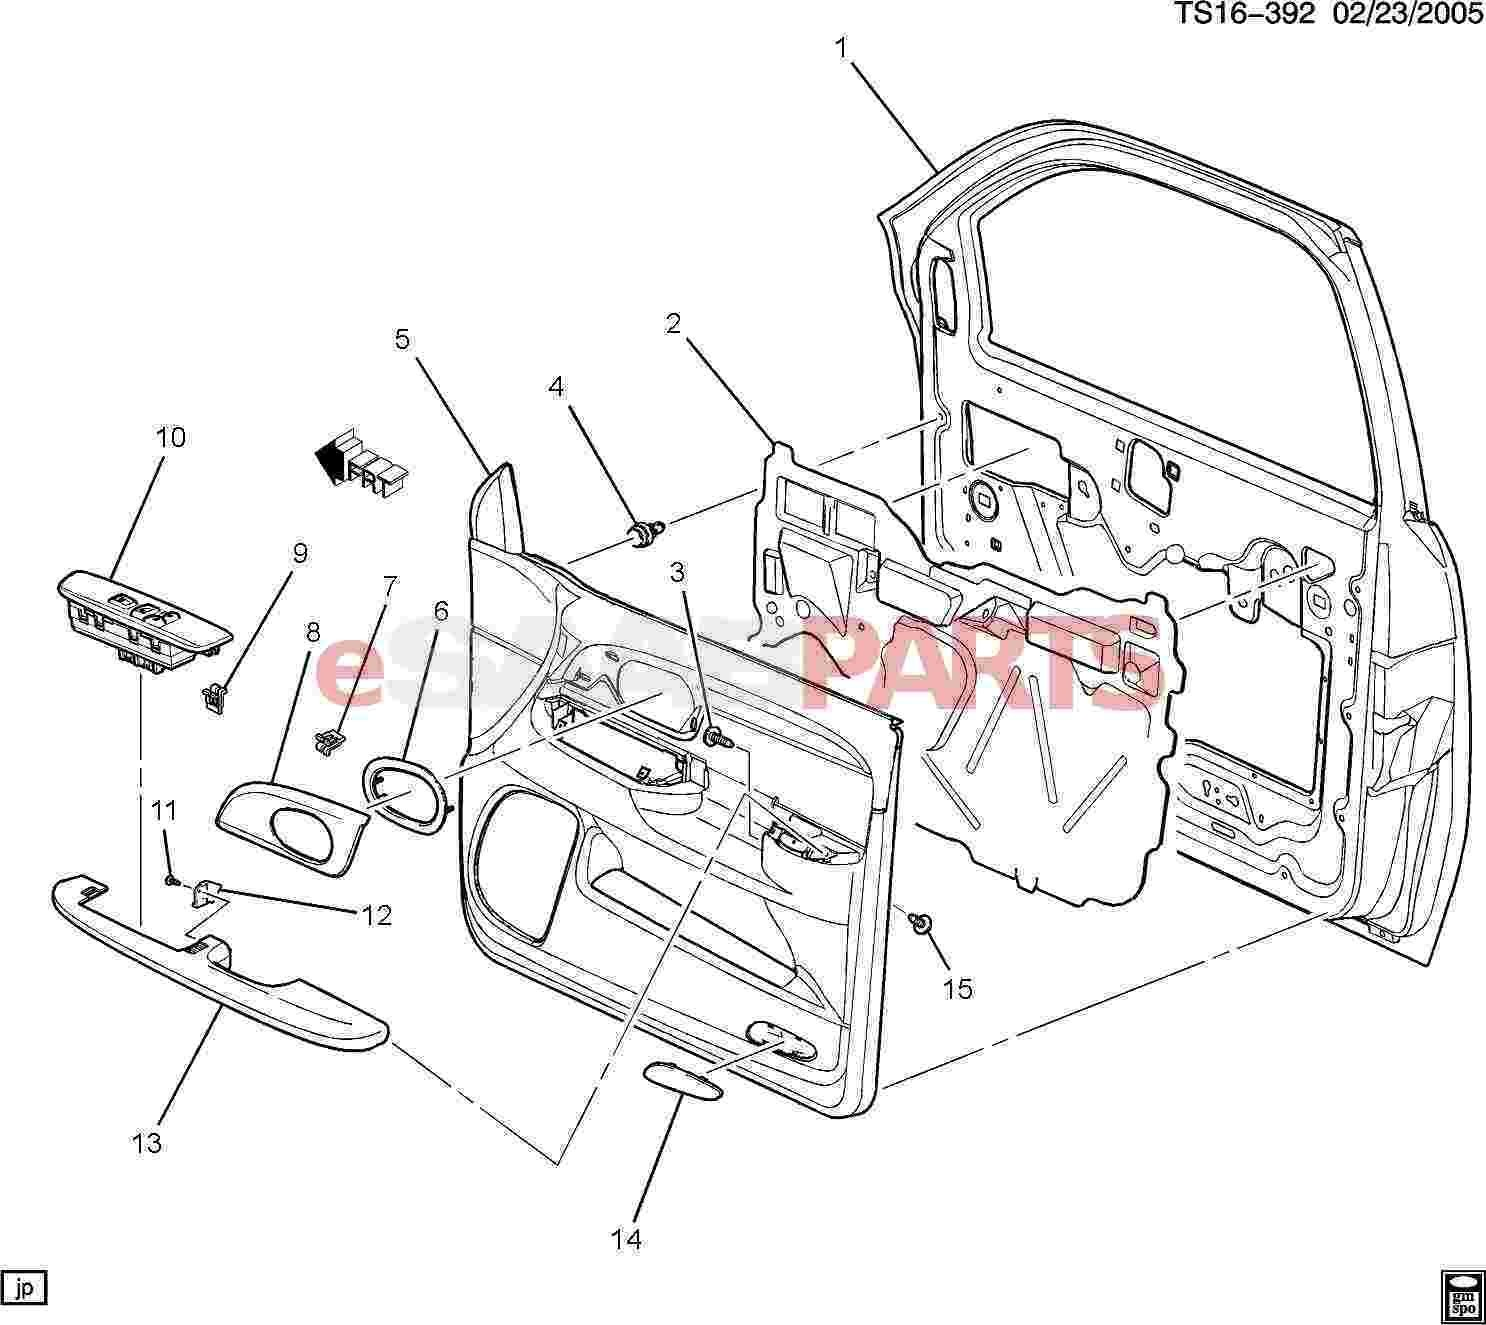 Car free body diagram car body diagram parts fresh esaabparts saab 9 car free body diagram car body diagram parts fresh esaabparts saab 9 7x car body external ccuart Choice Image